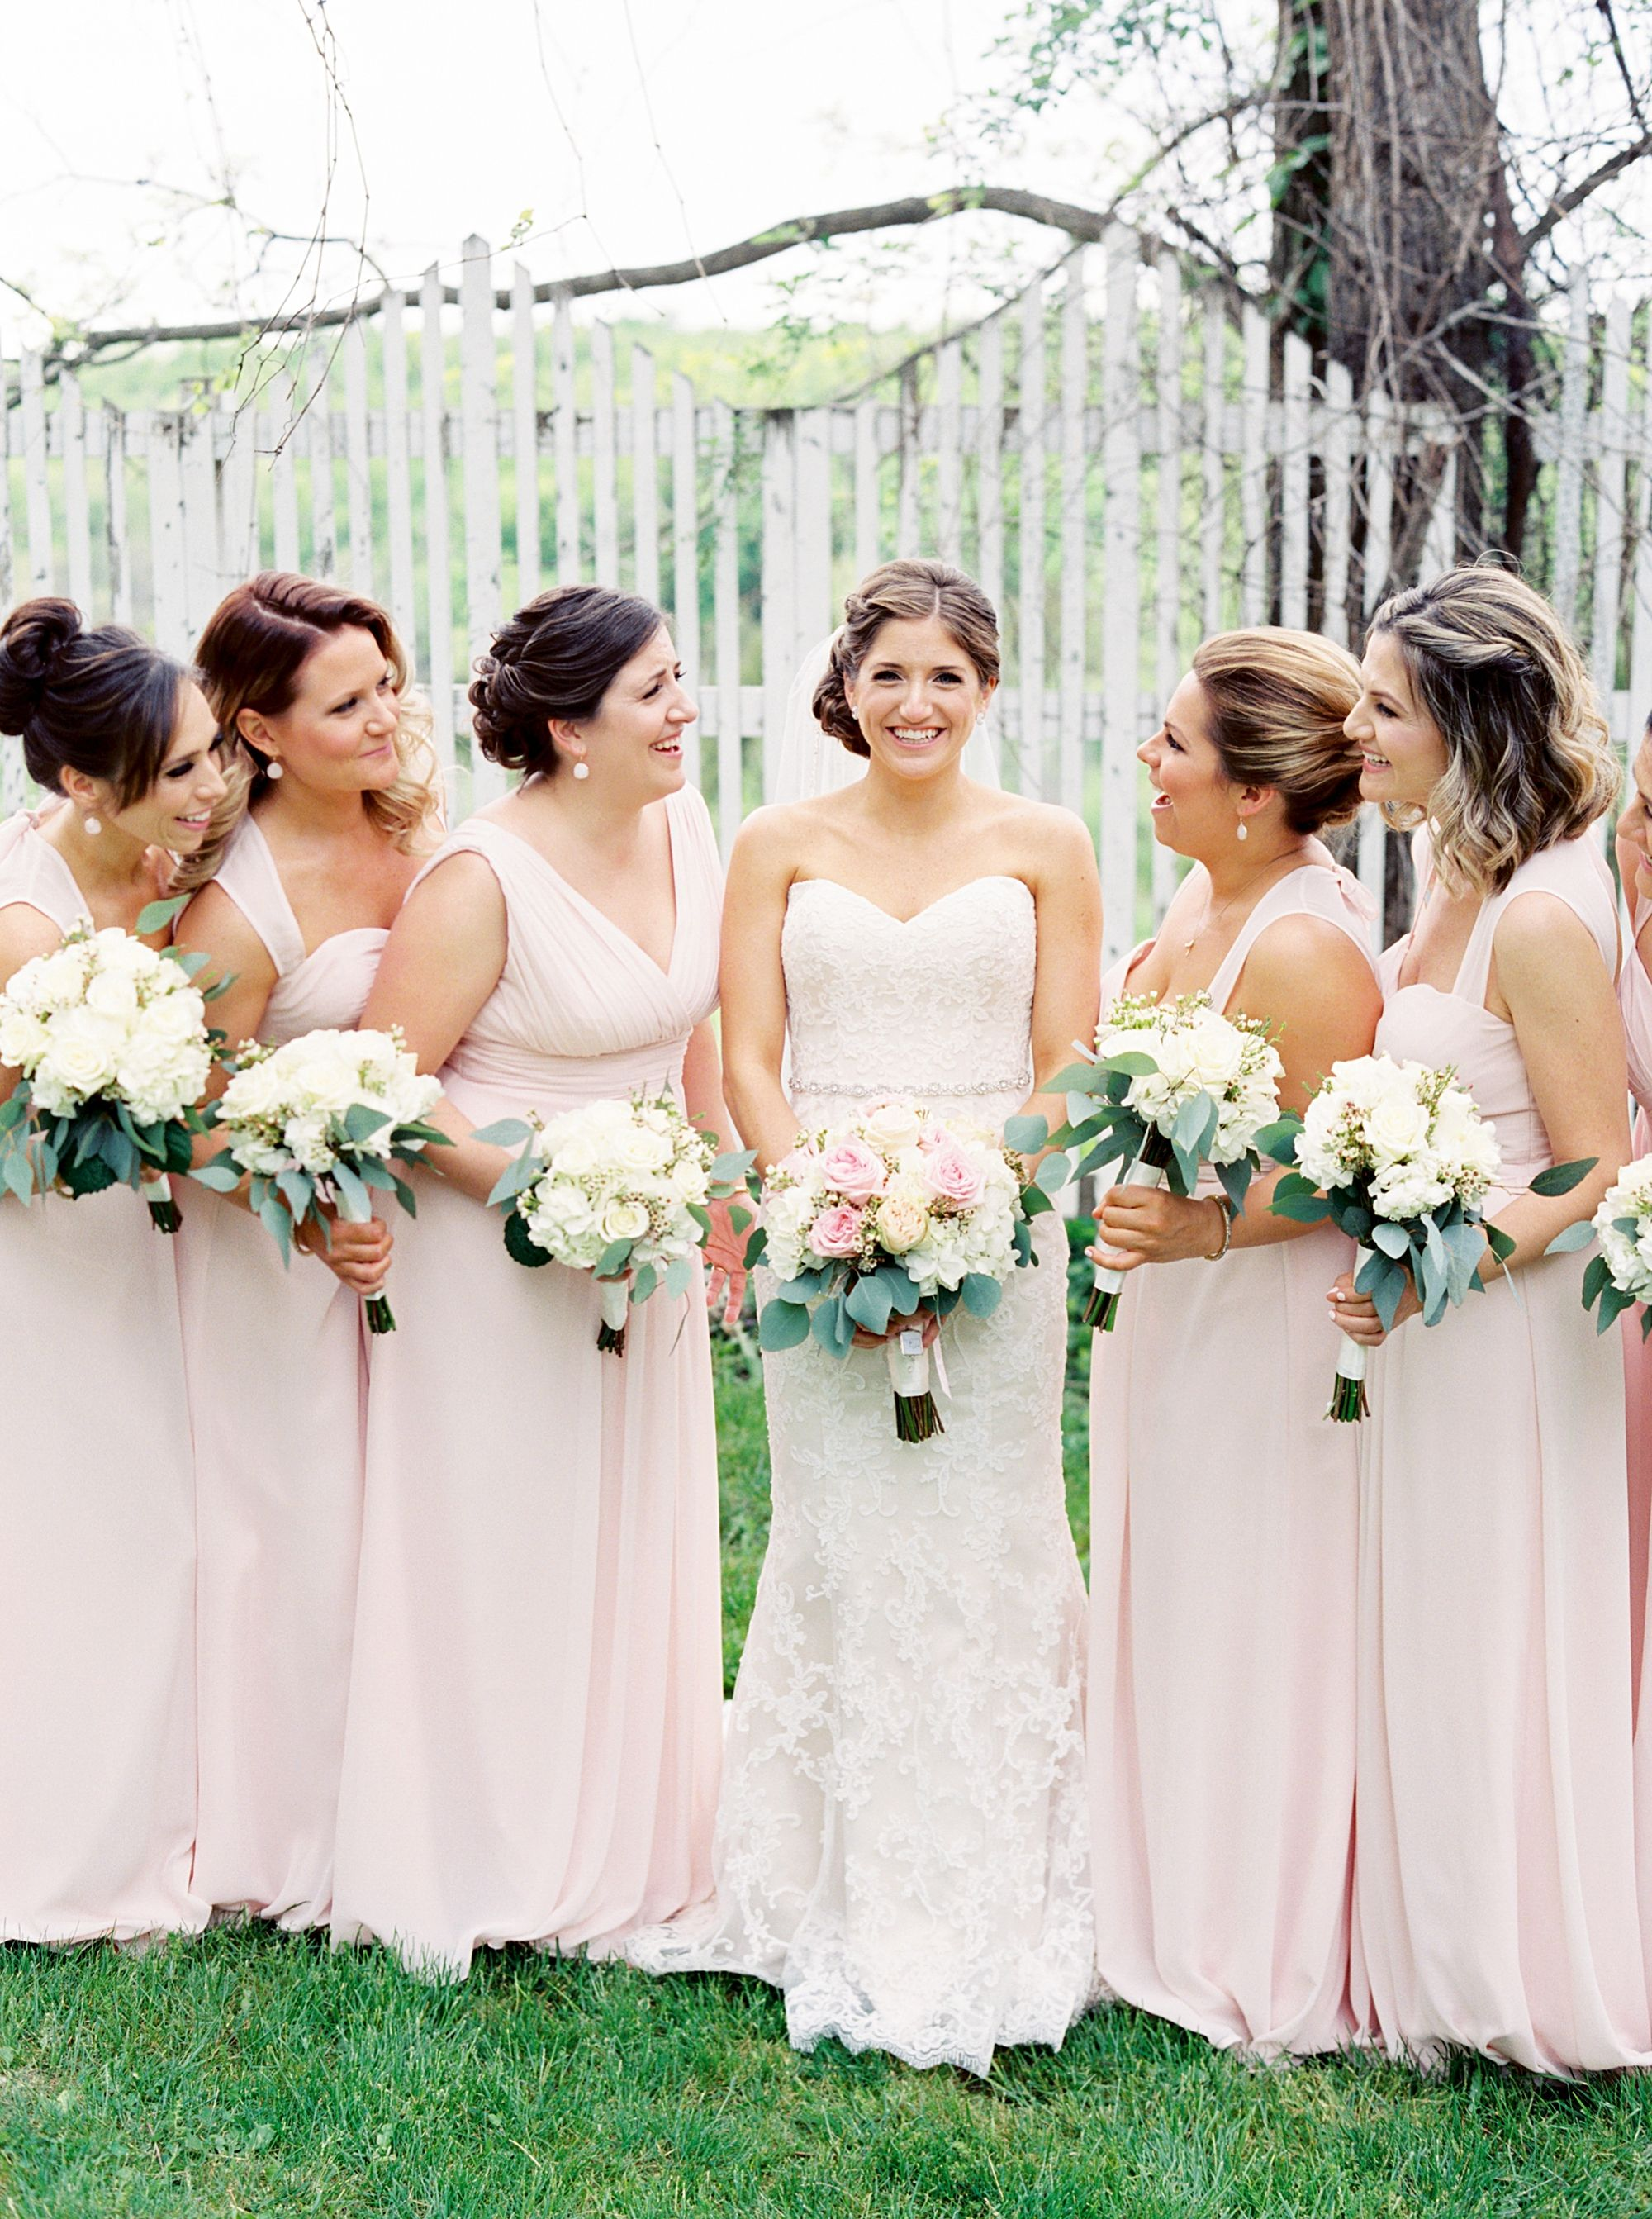 Sarah Josh New York Wedding Jessica Gold Photography New York Wedding Wedding Bridesmaid Dresses